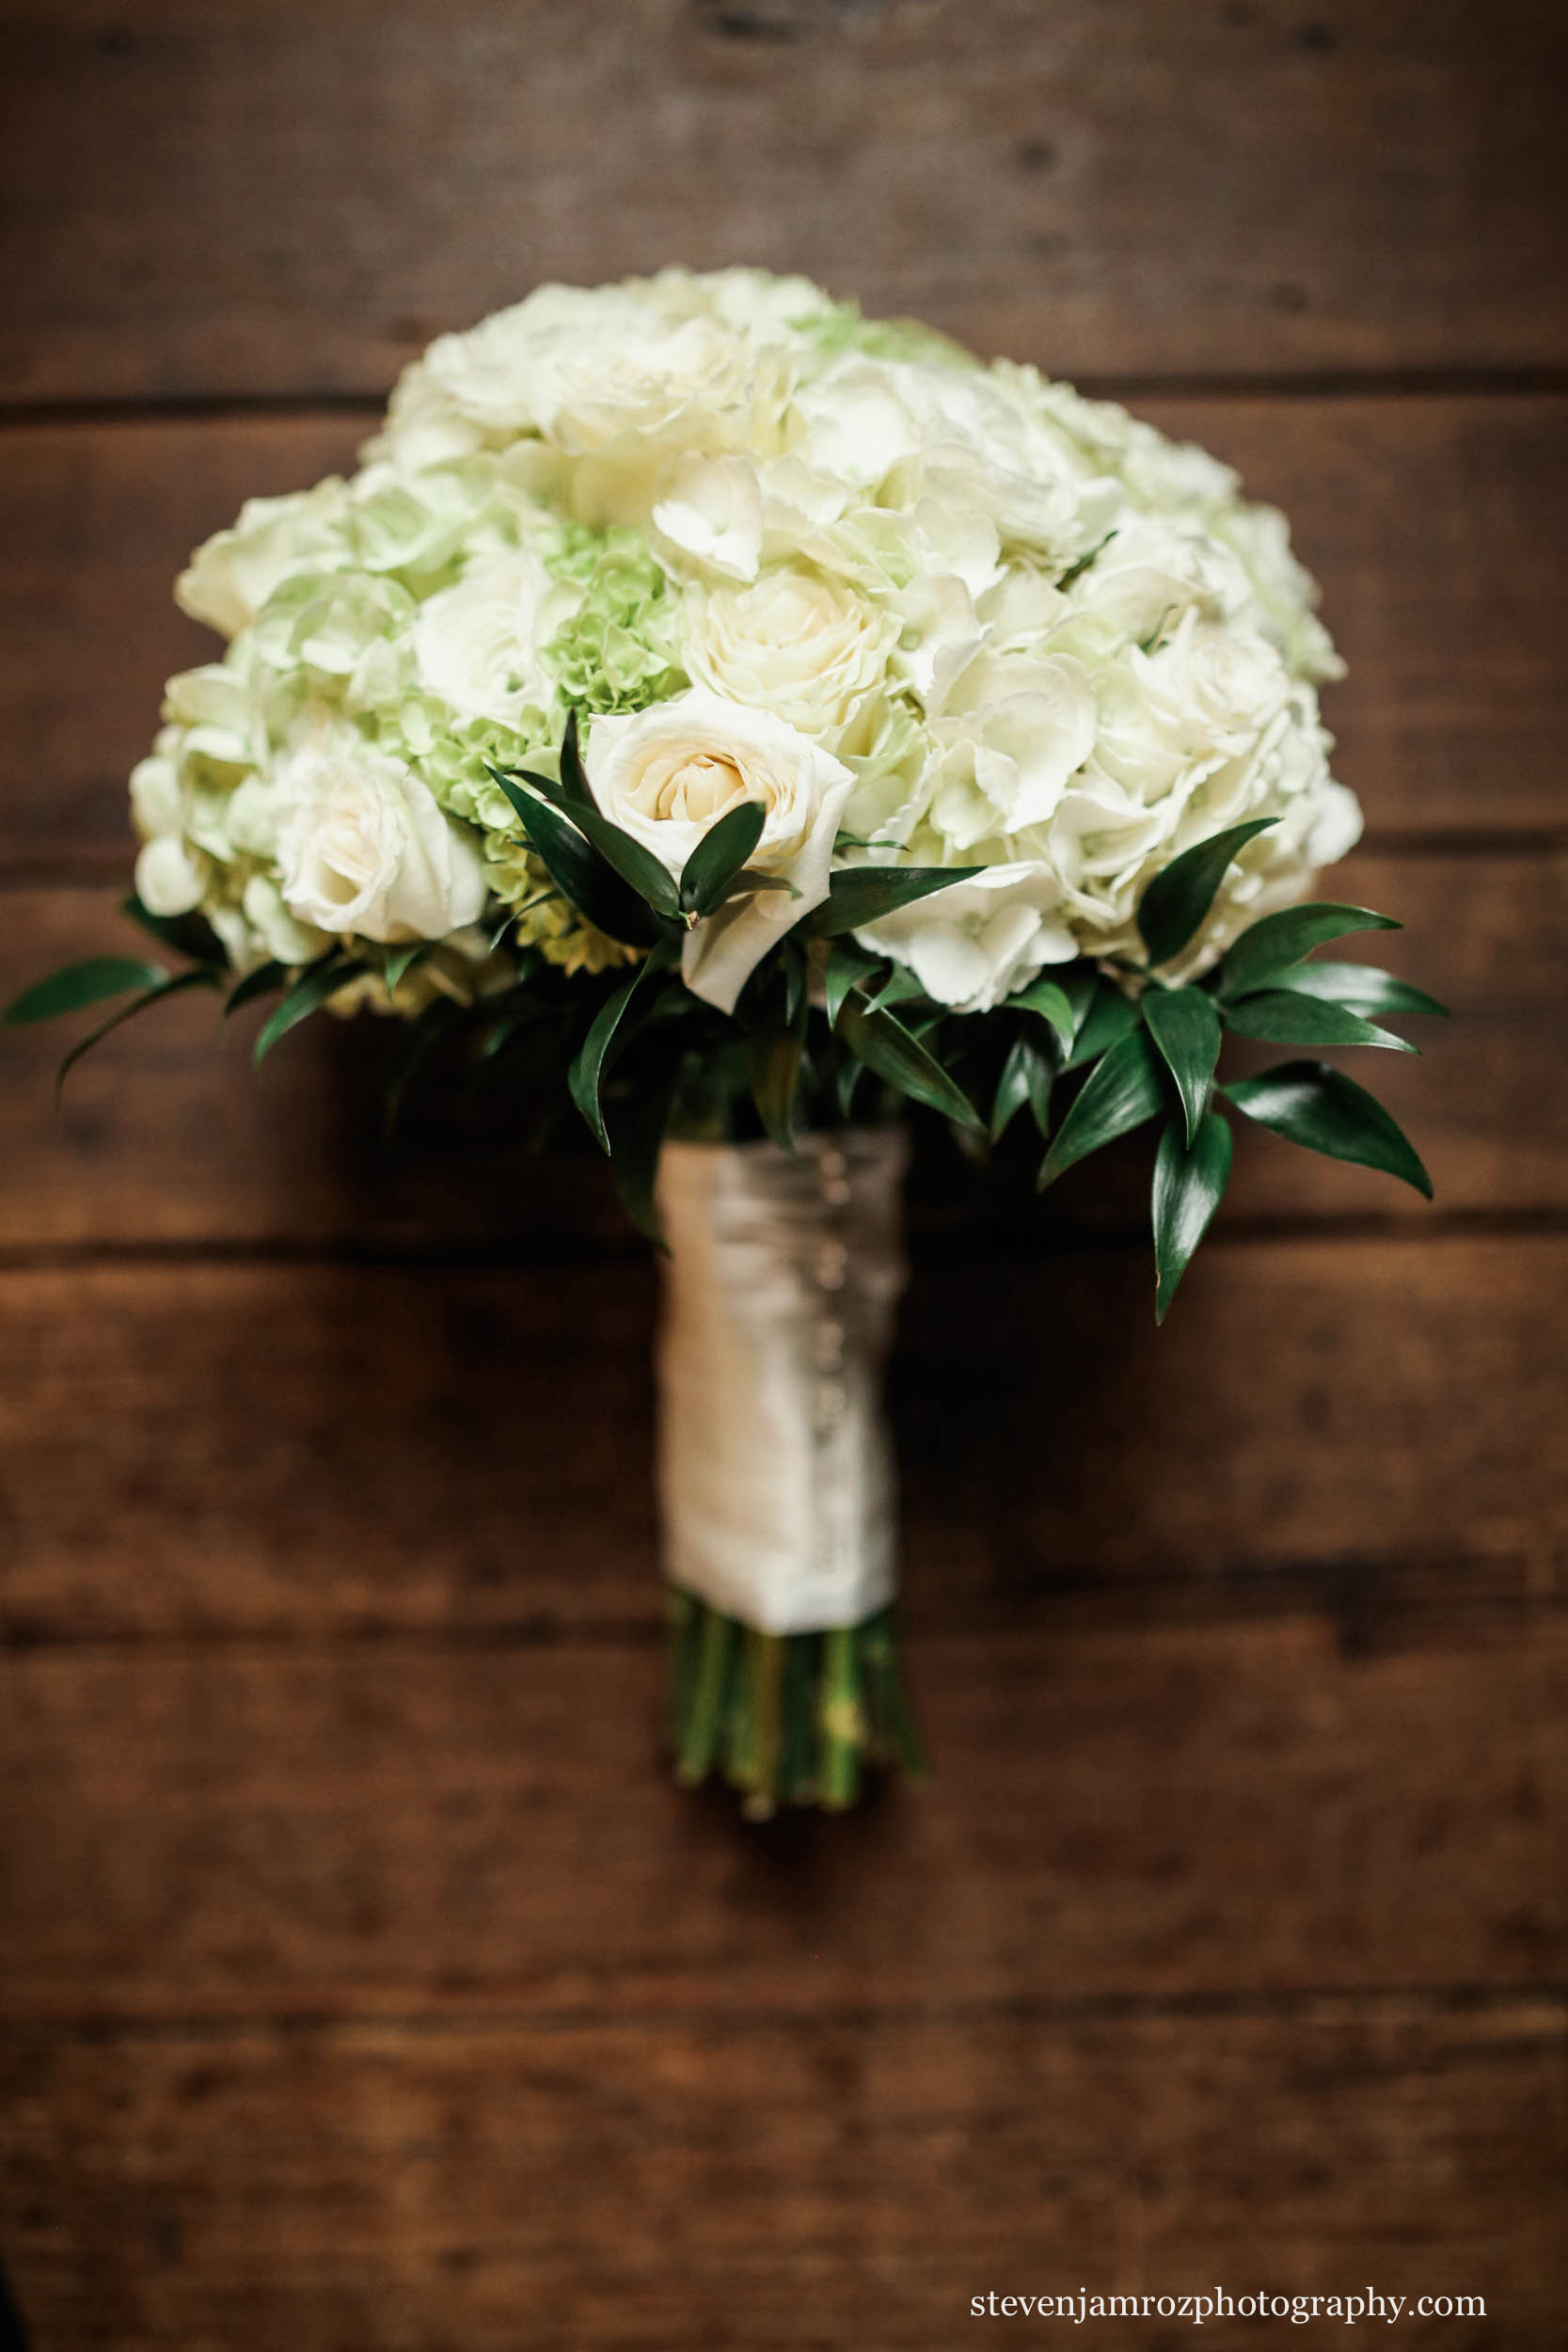 flowers-rich-colors-white-green-bouquet-beautiful-steven-jamroz-0752.jpg